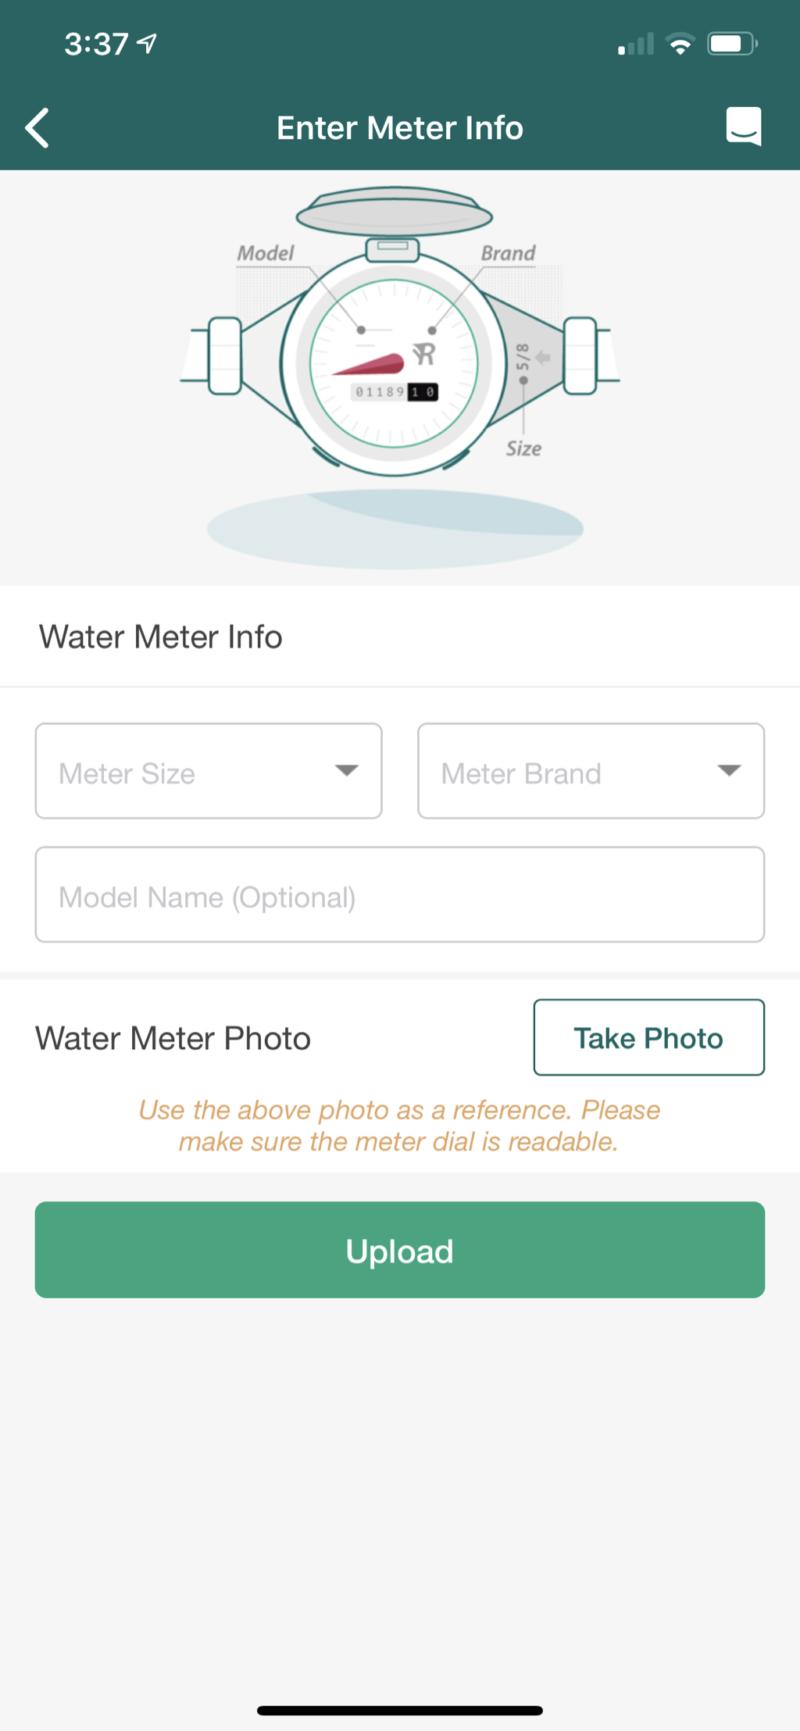 water meter model